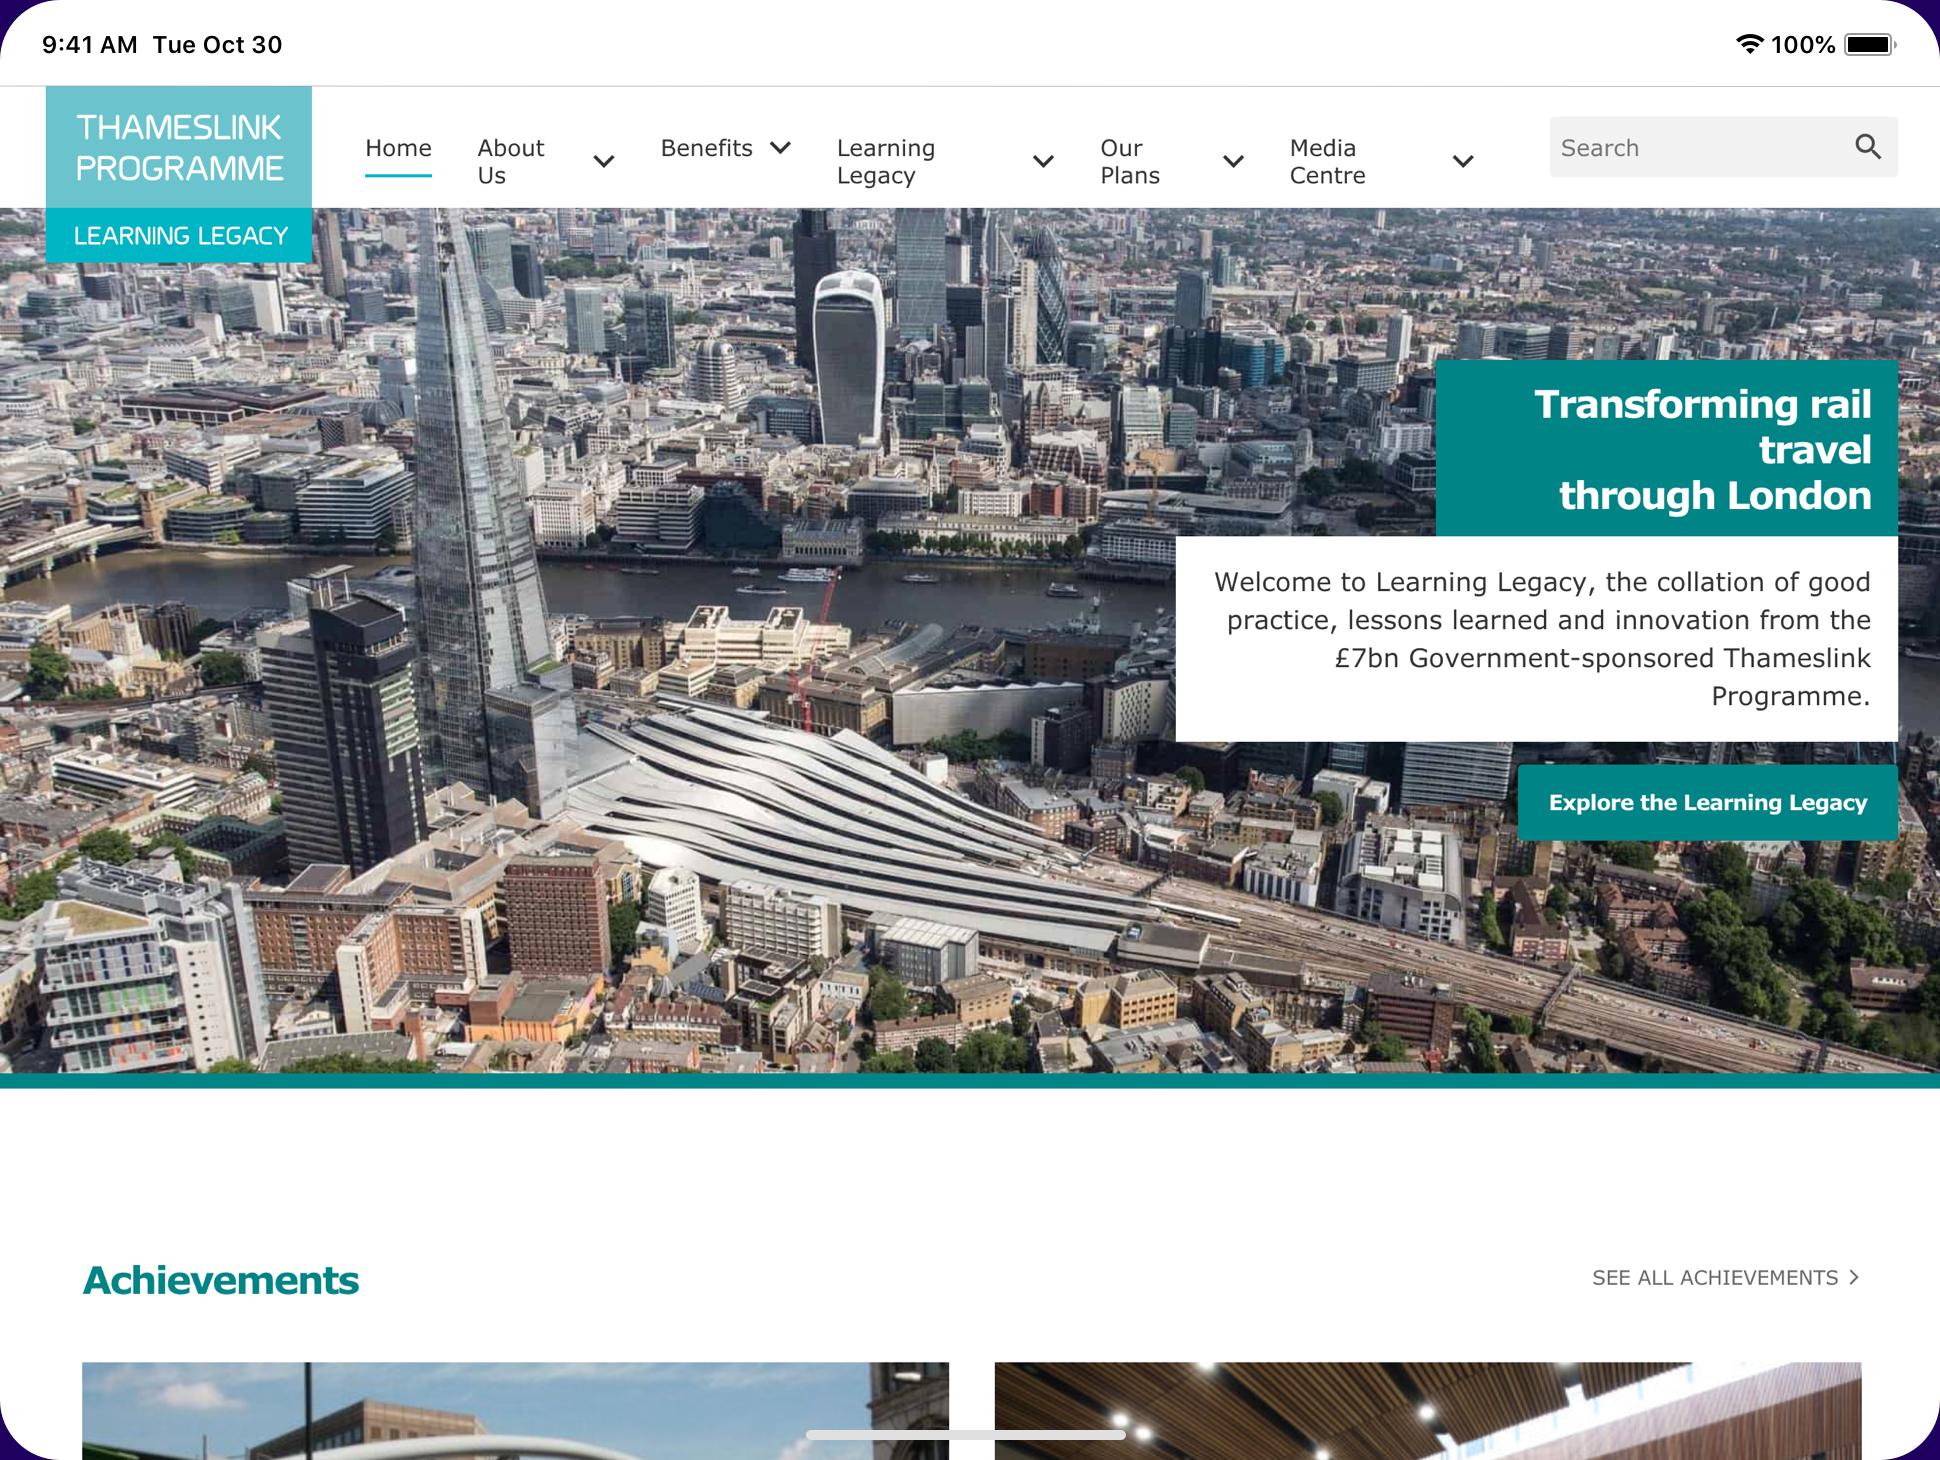 Thameslink website screenshot